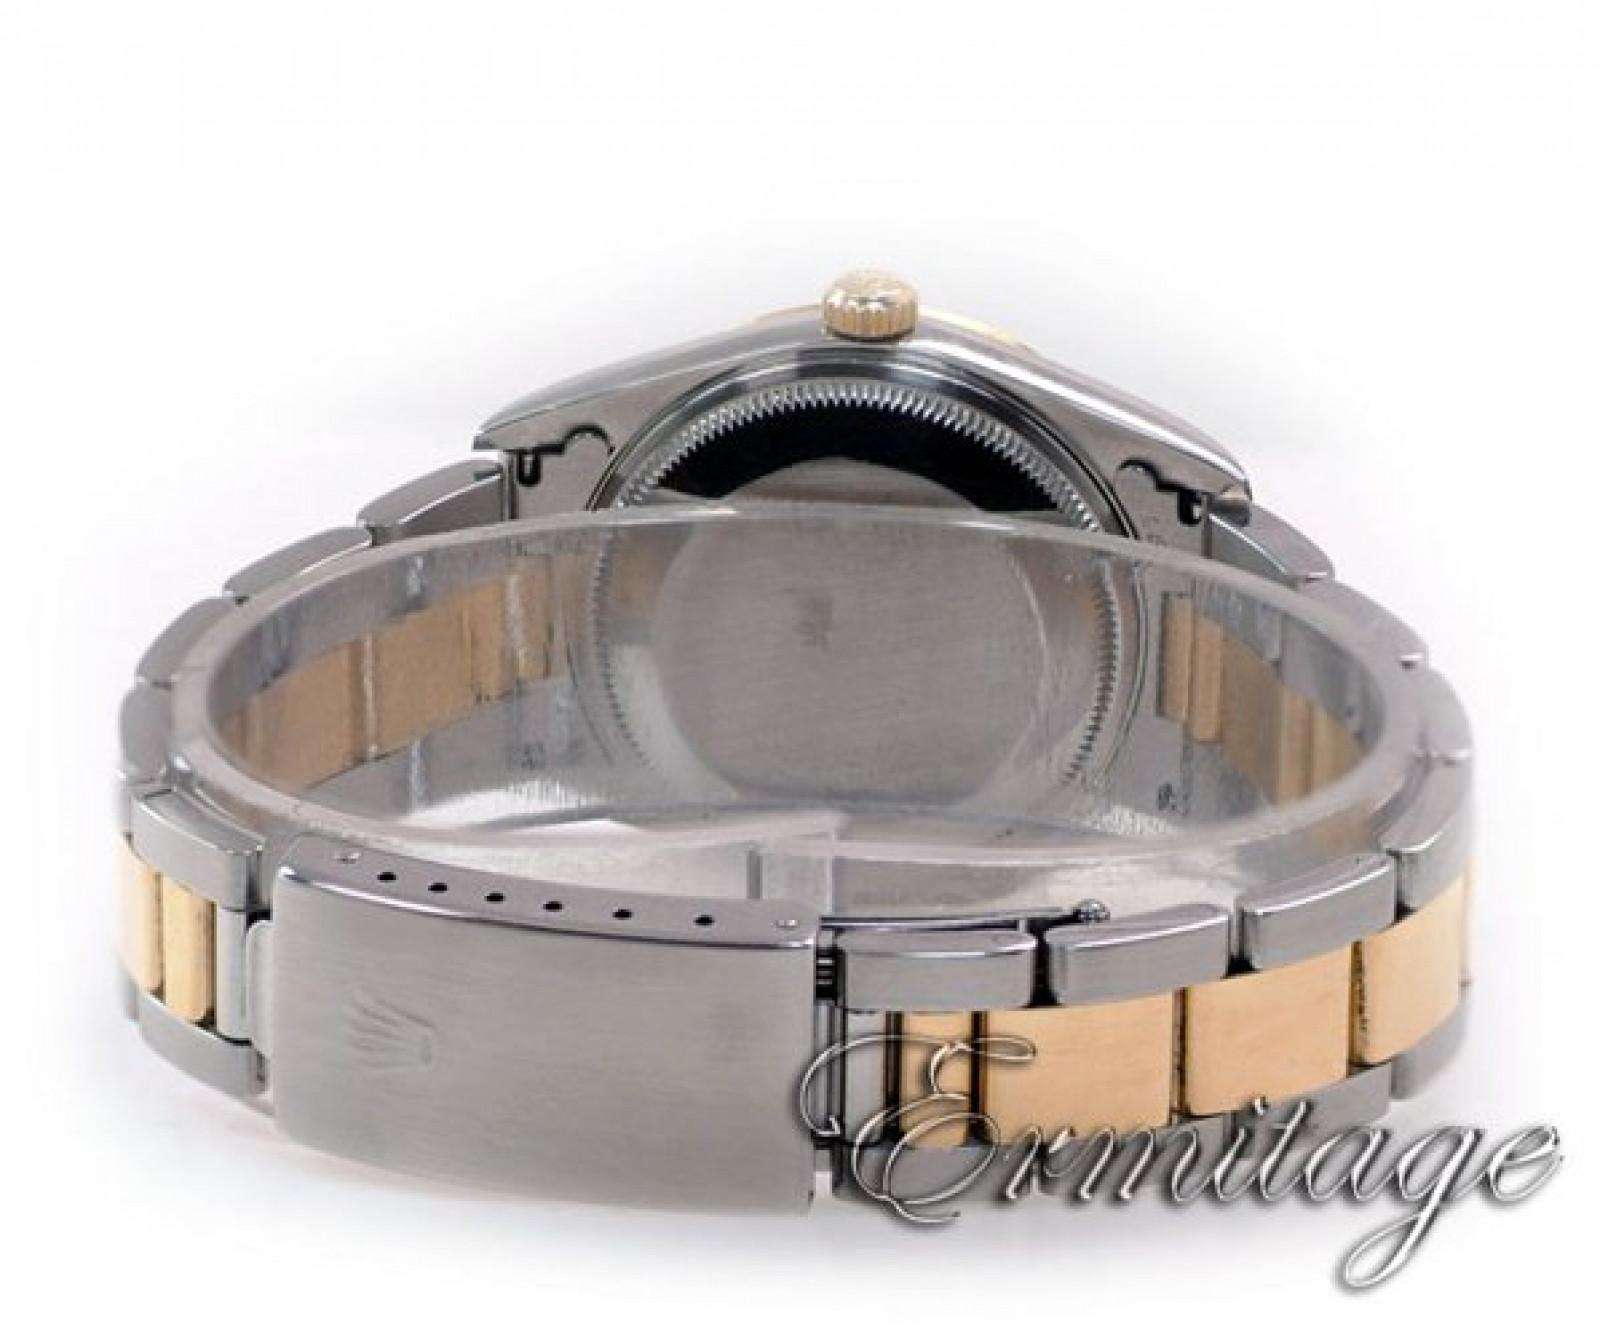 Rolex Date 15233 Gold & Steel Champagne 2000